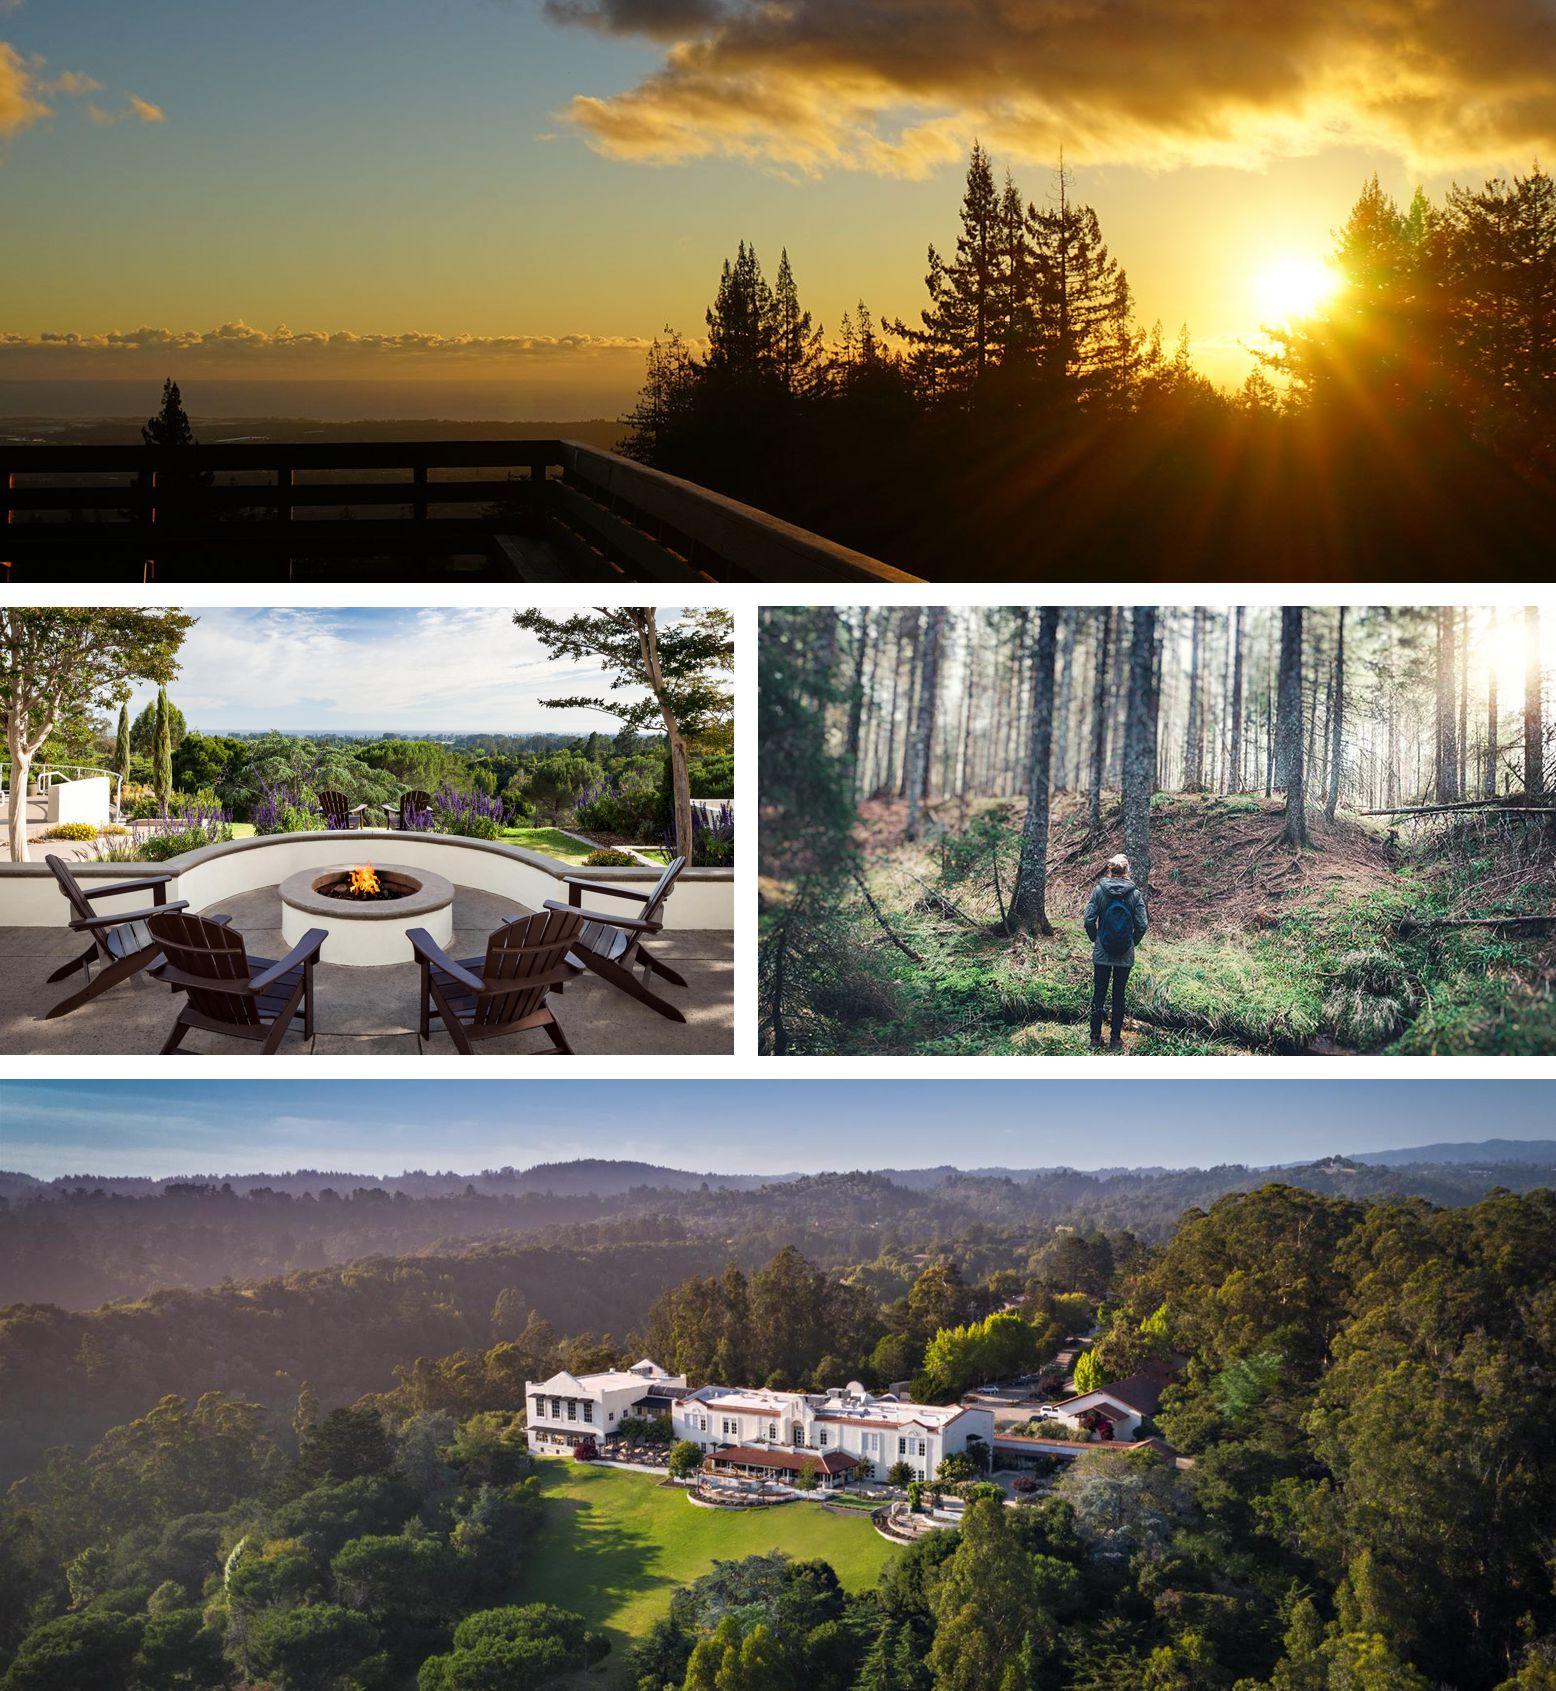 Chaminade retreat location photo grid